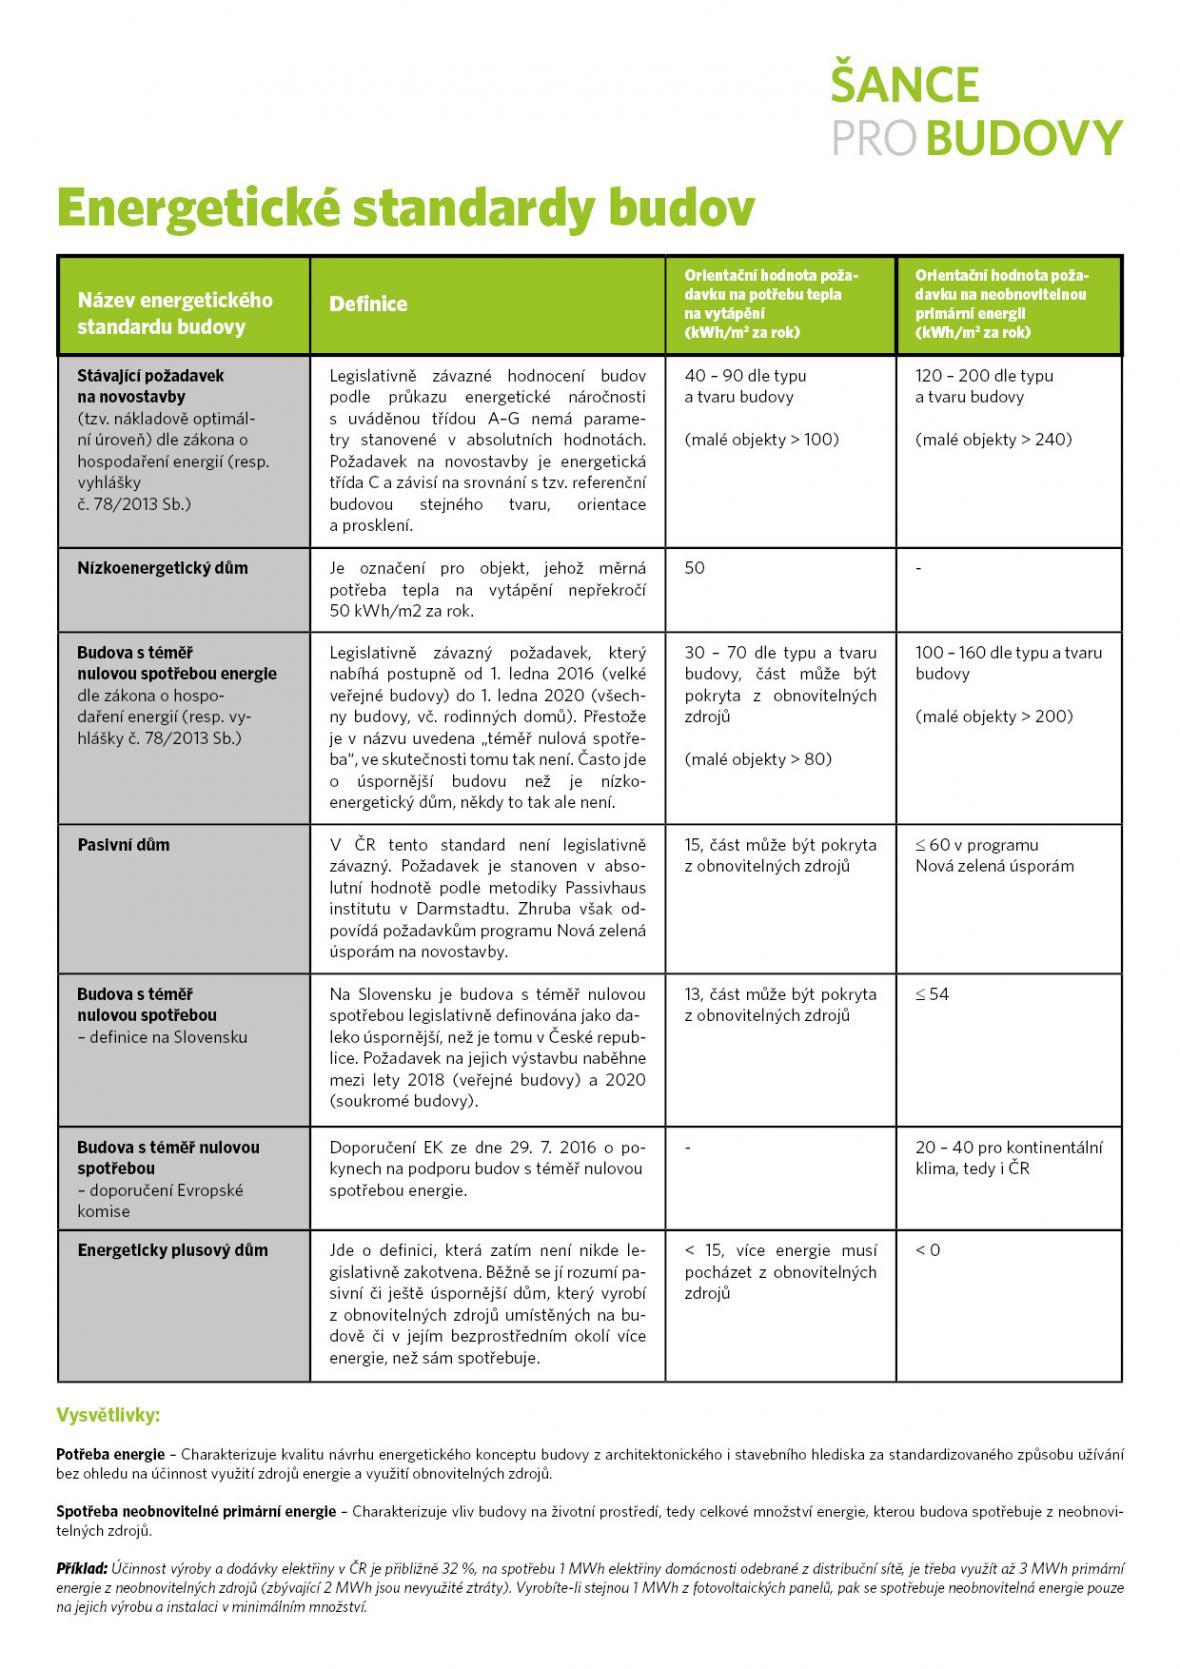 Energetické standardy budov